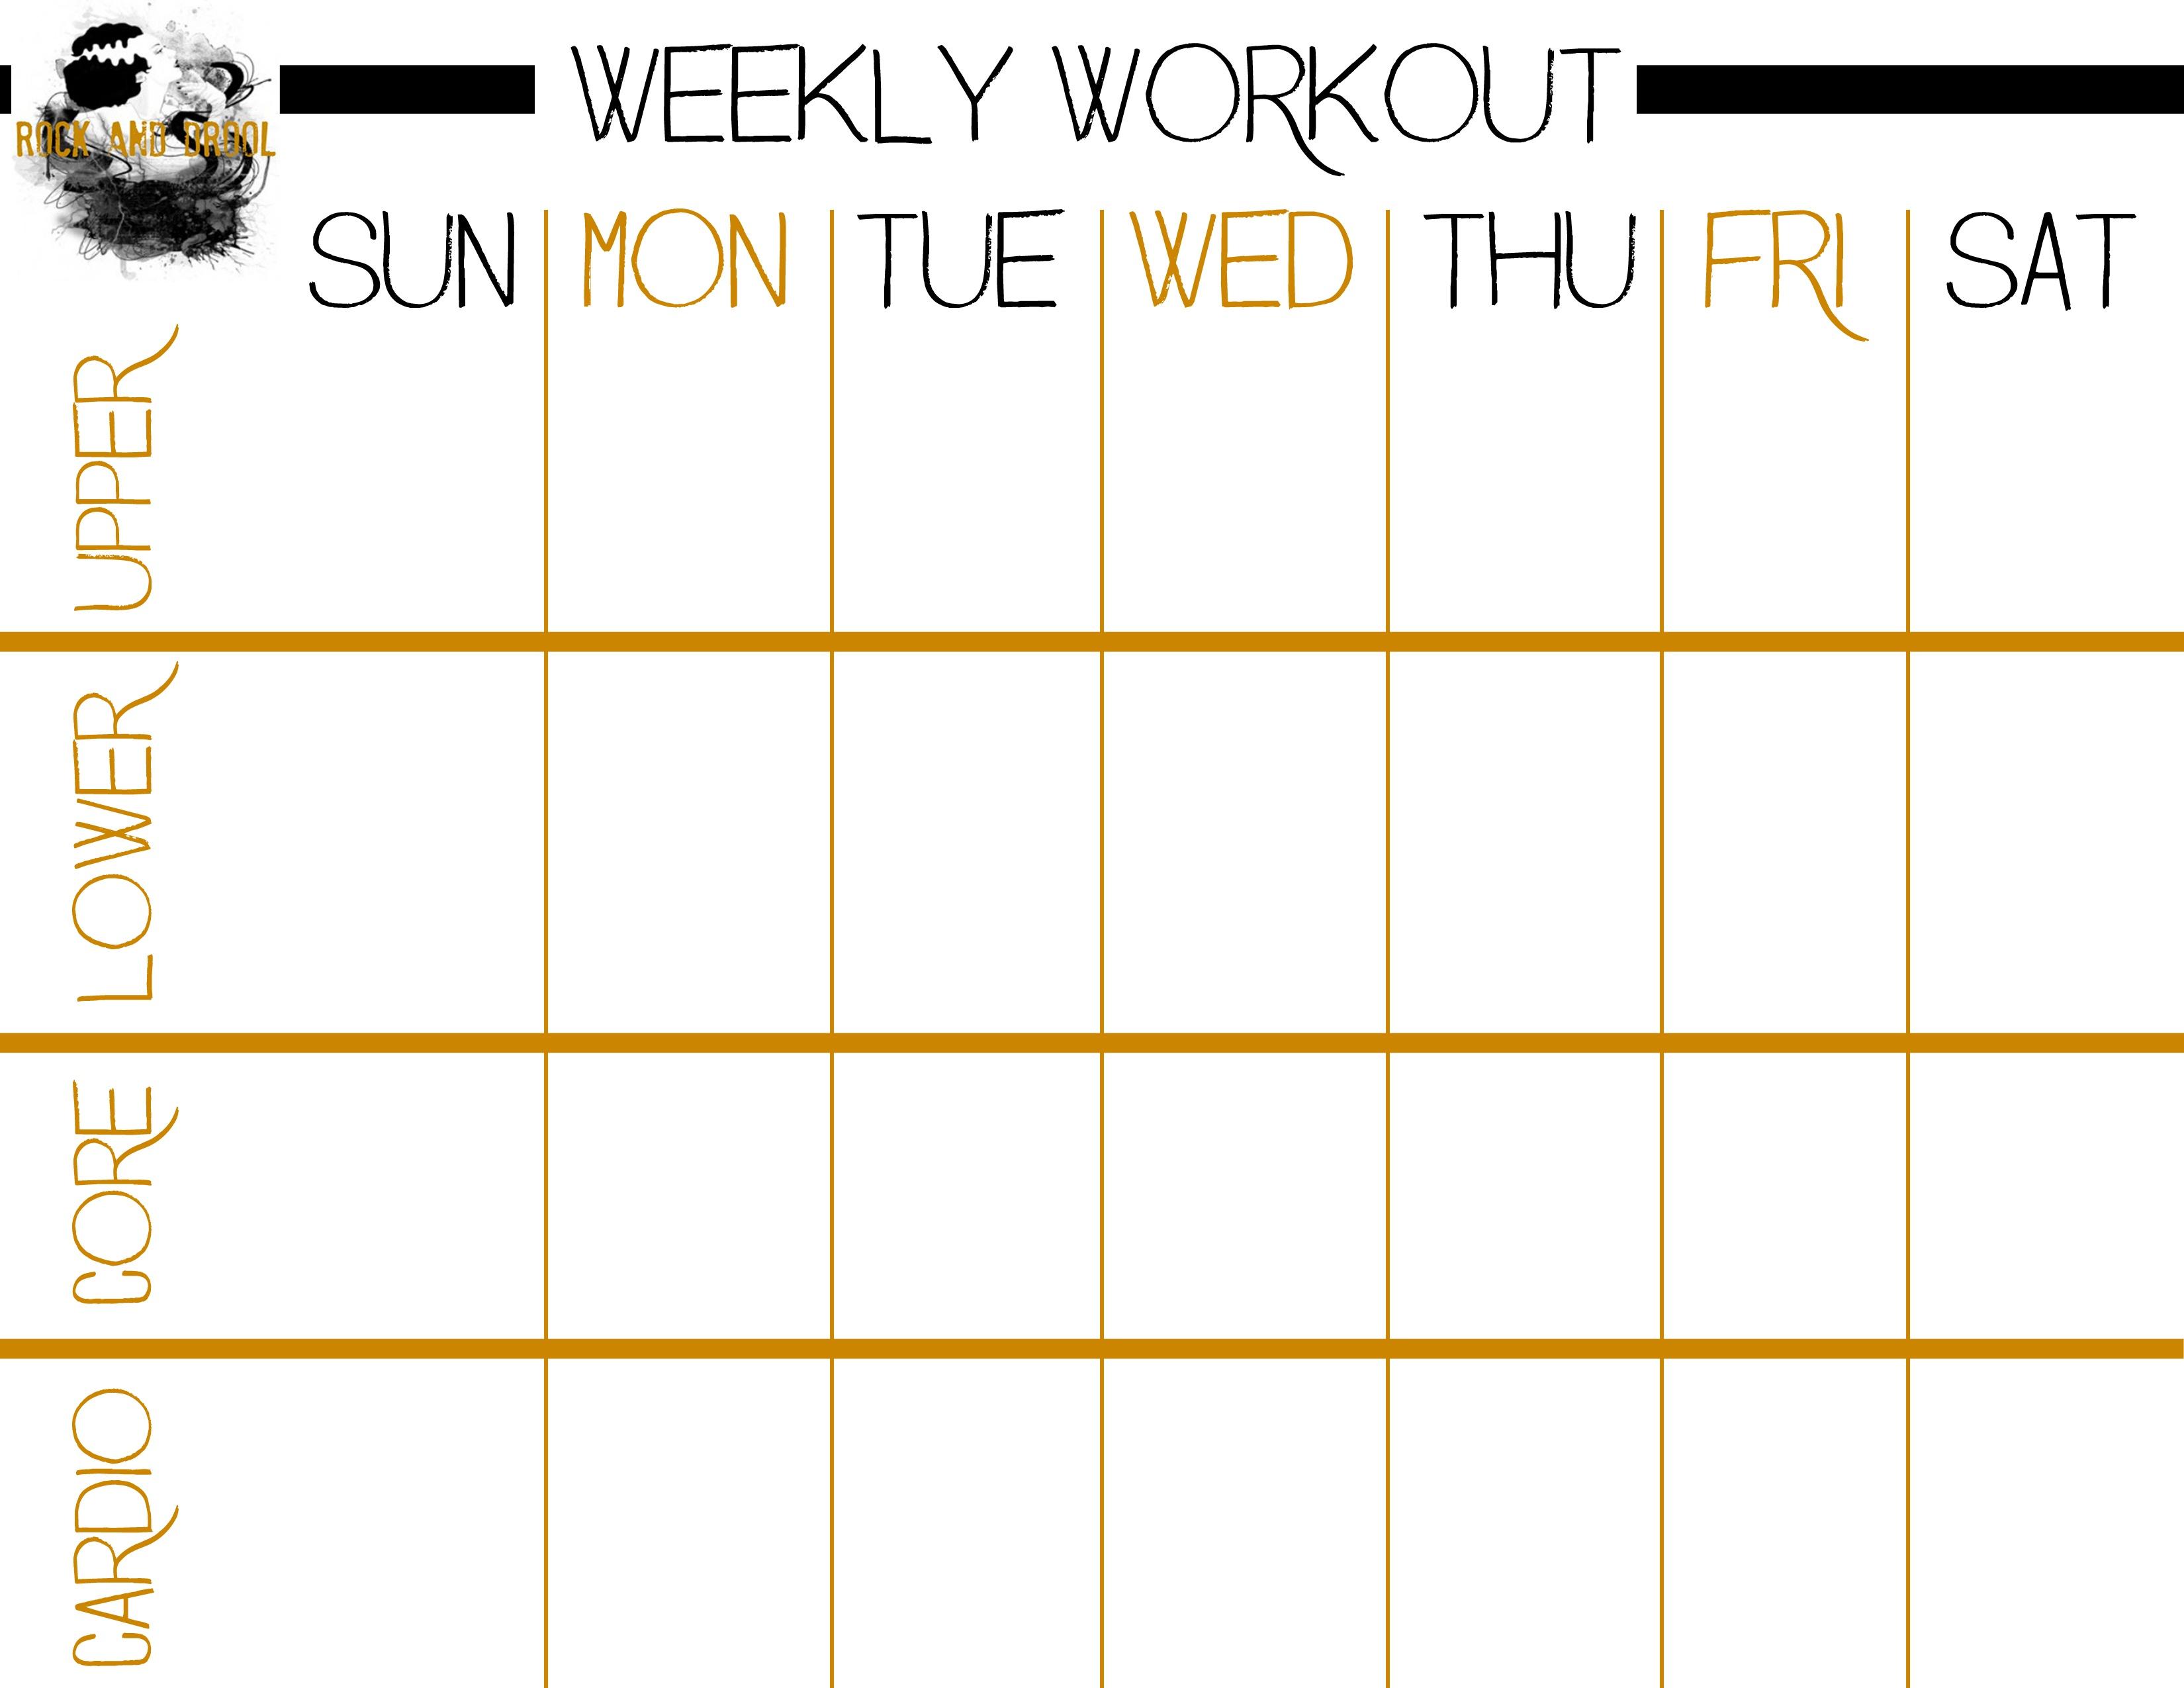 Basic Full Body Workout Plus Free Printable Workout Sheet - Rock And - Free Printable Gym Workout Routines